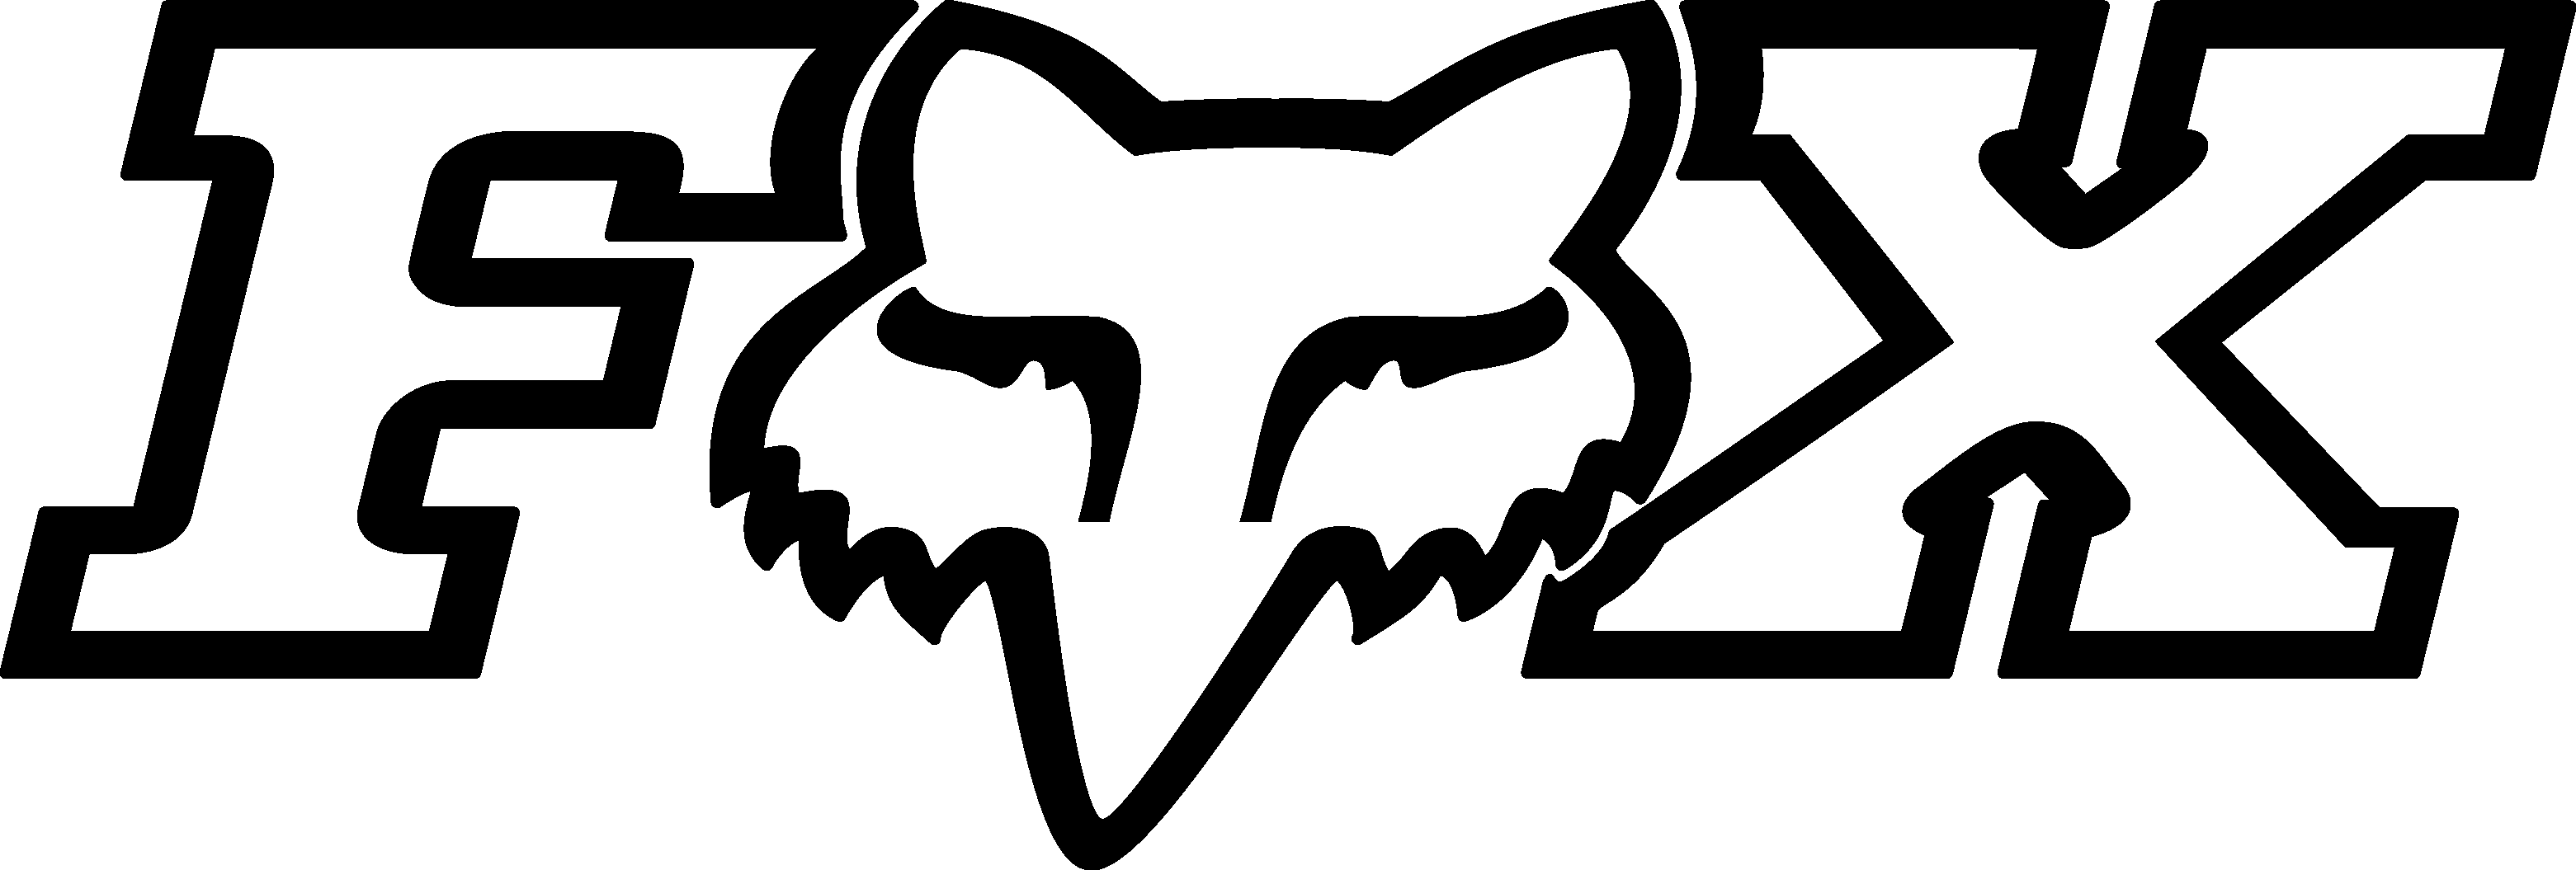 Fox Racing Logo Png (+).